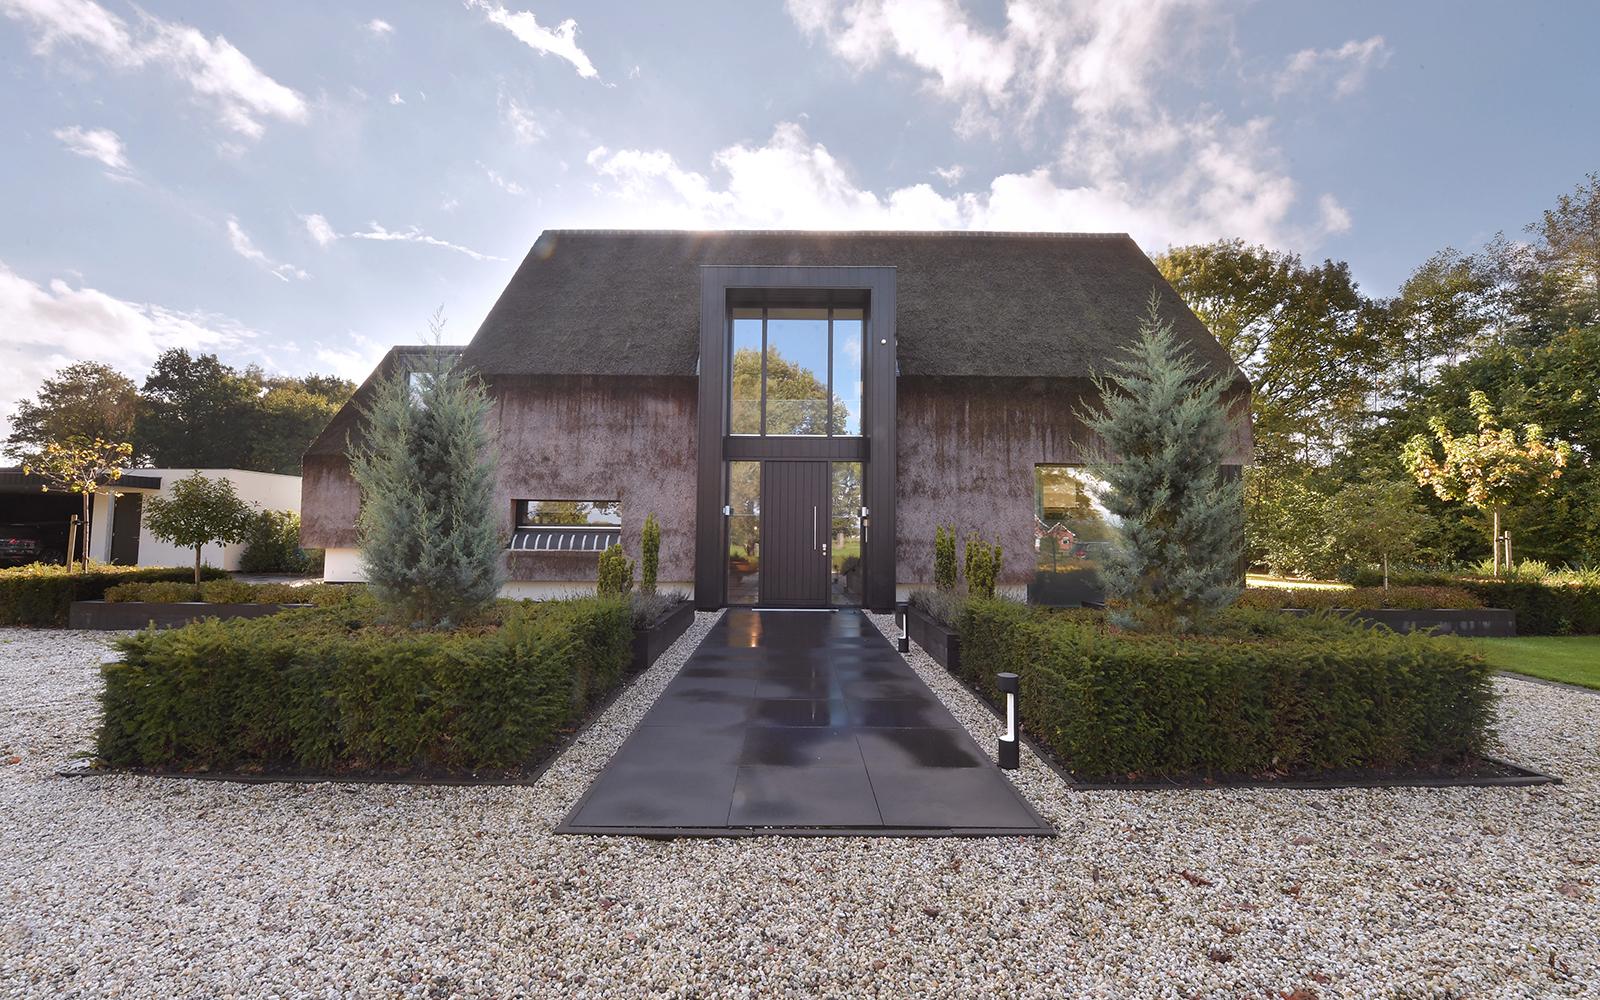 Villa, Het Fundament Architectuur, exclusieve villa, architectenbureau, ontwerpbureau, interieur ontwerp, exterieur ontwerp, the art of living